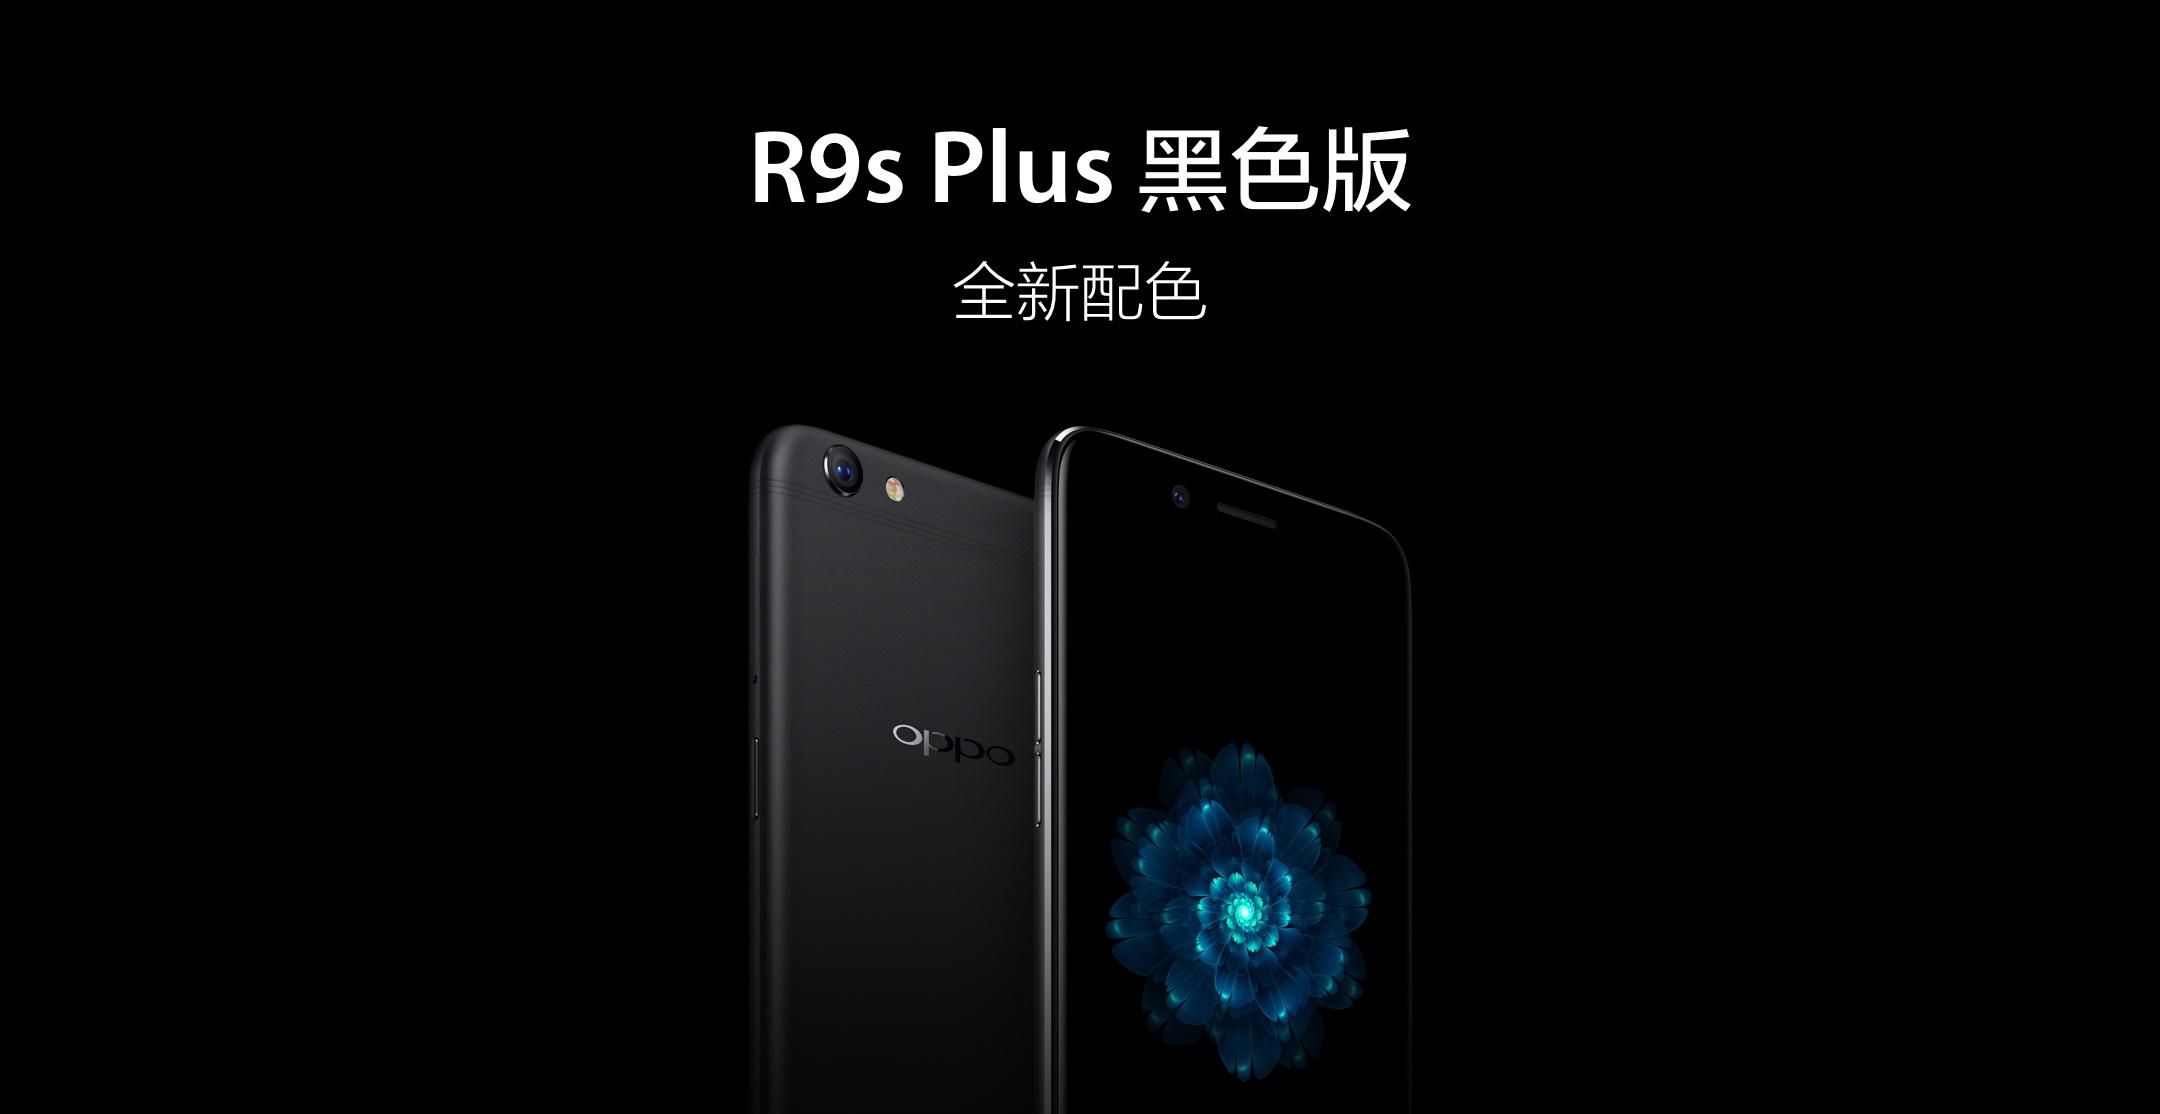 R9s Plus 黑色版